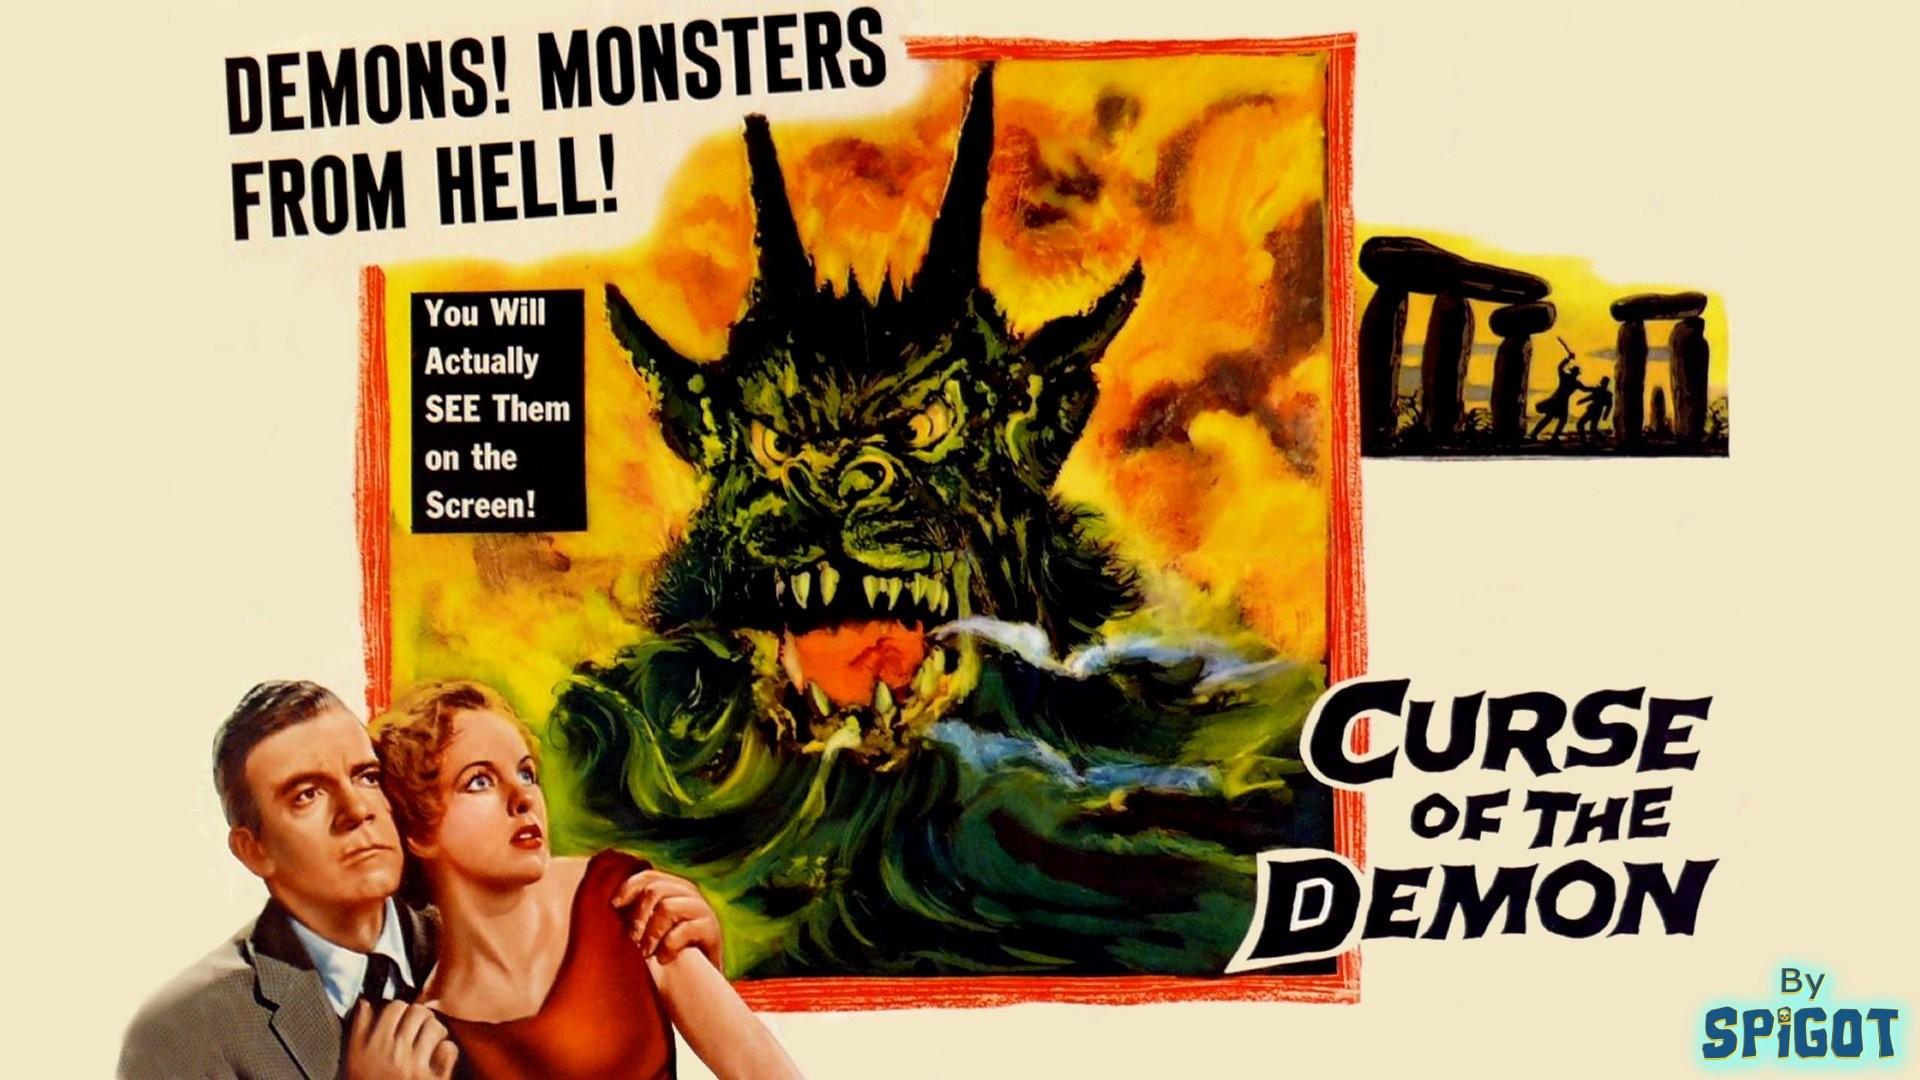 one of my fav classic horror films